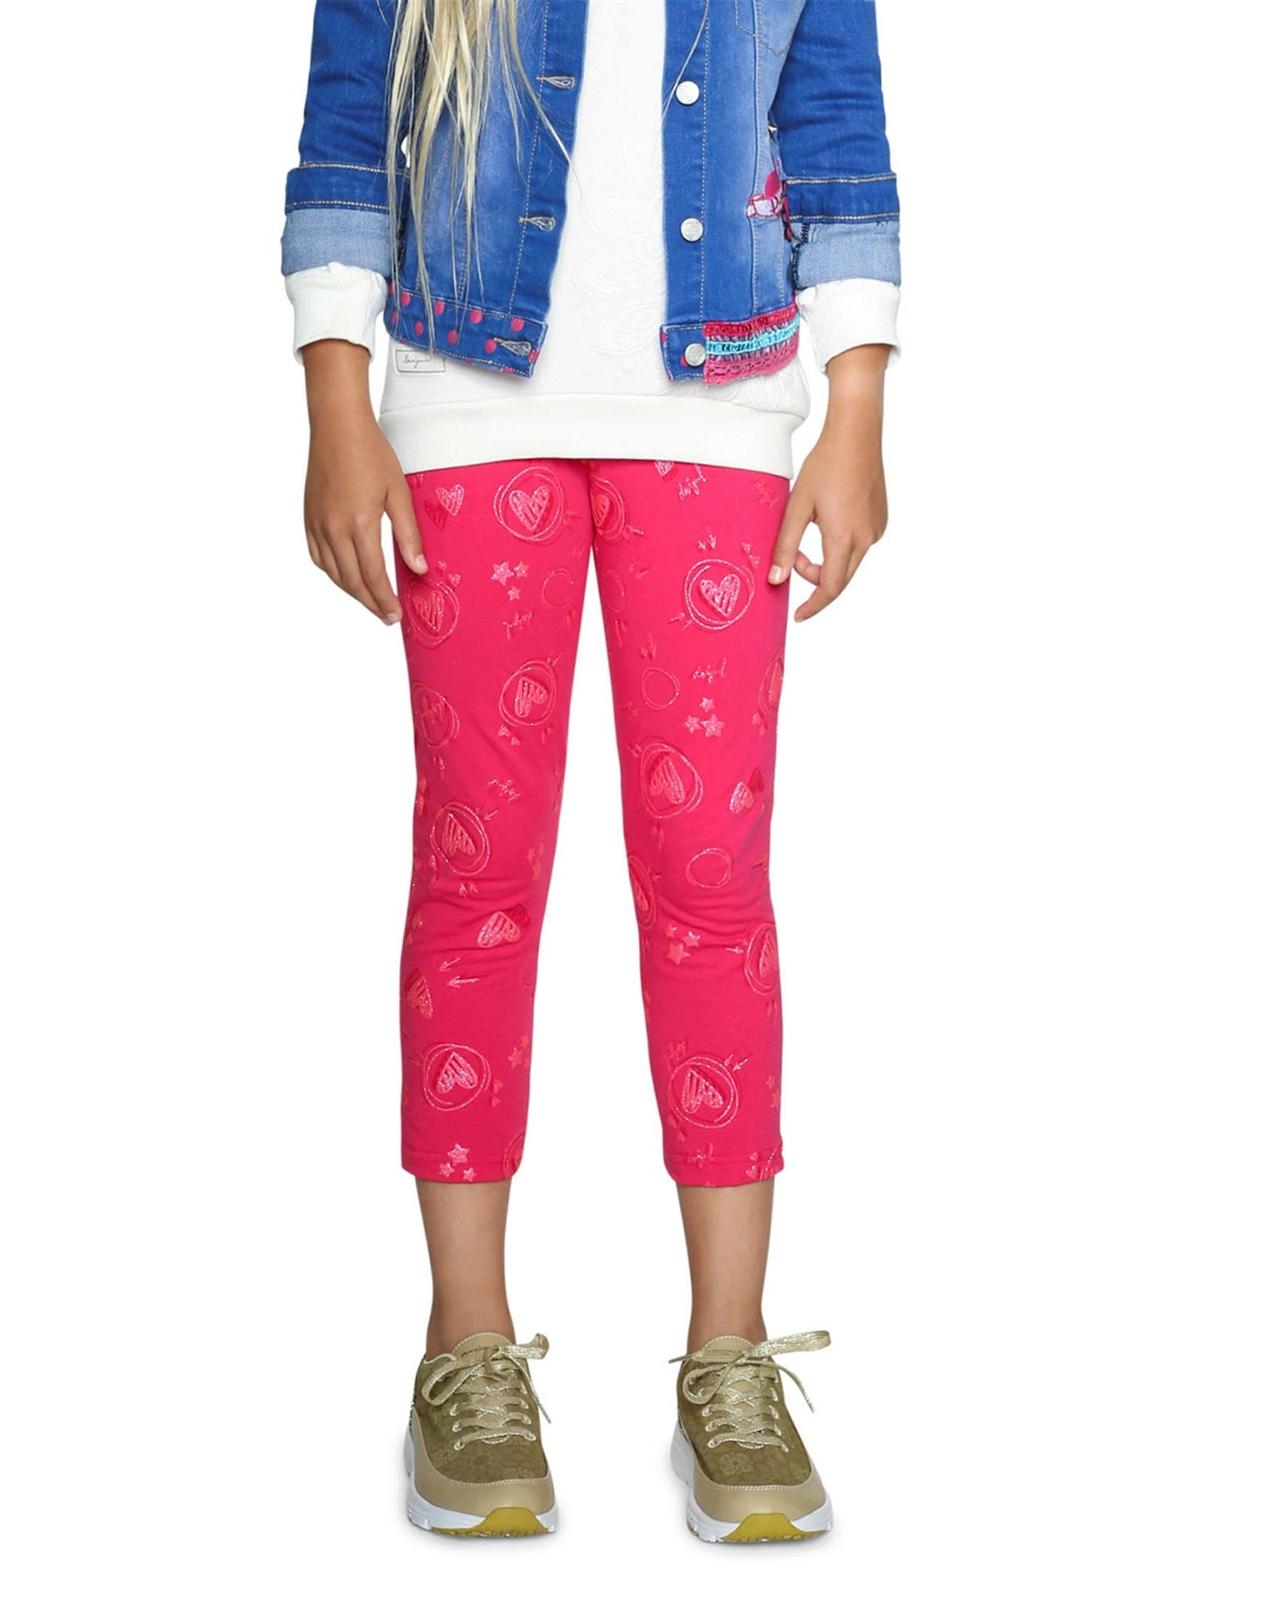 Sizes 5-14 Desigual Girls Leggings Floral in Fuchsia